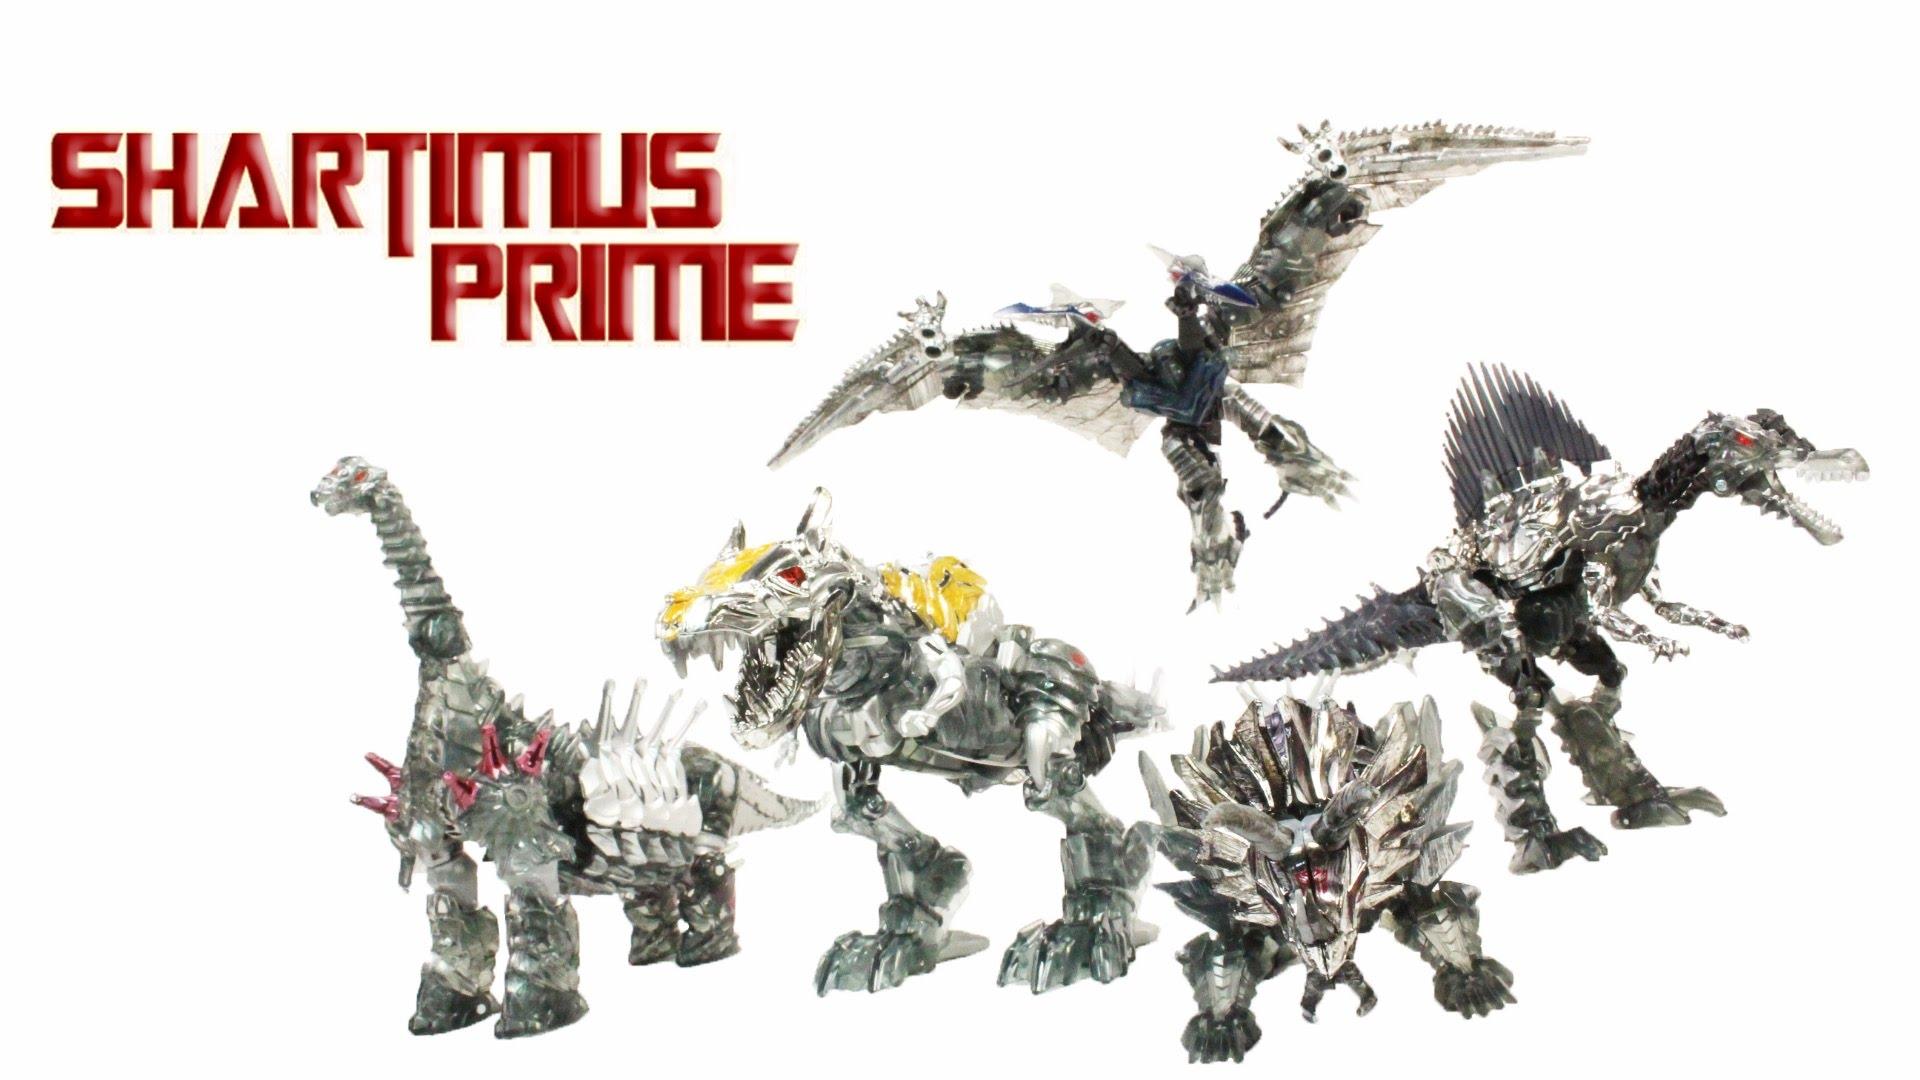 dinobot transformers shartimus prime